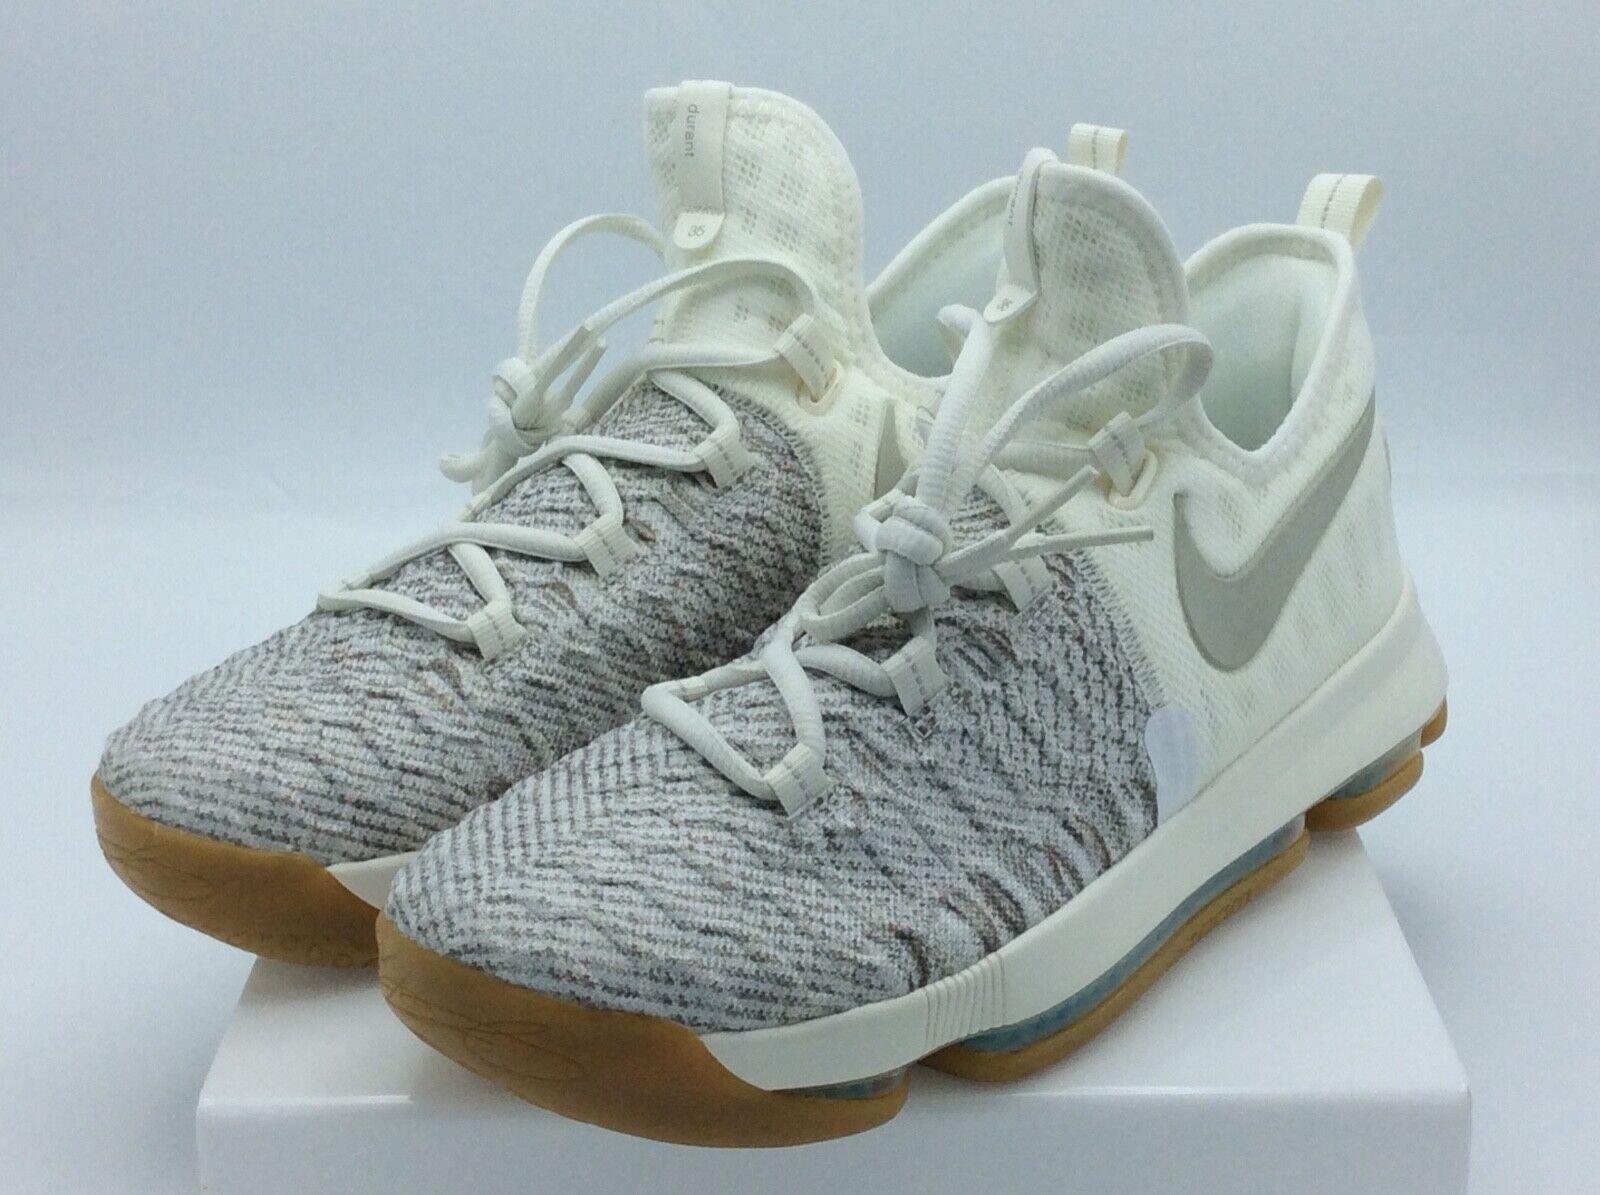 Nike KD 9 Boys' Preschool Ivory/pale